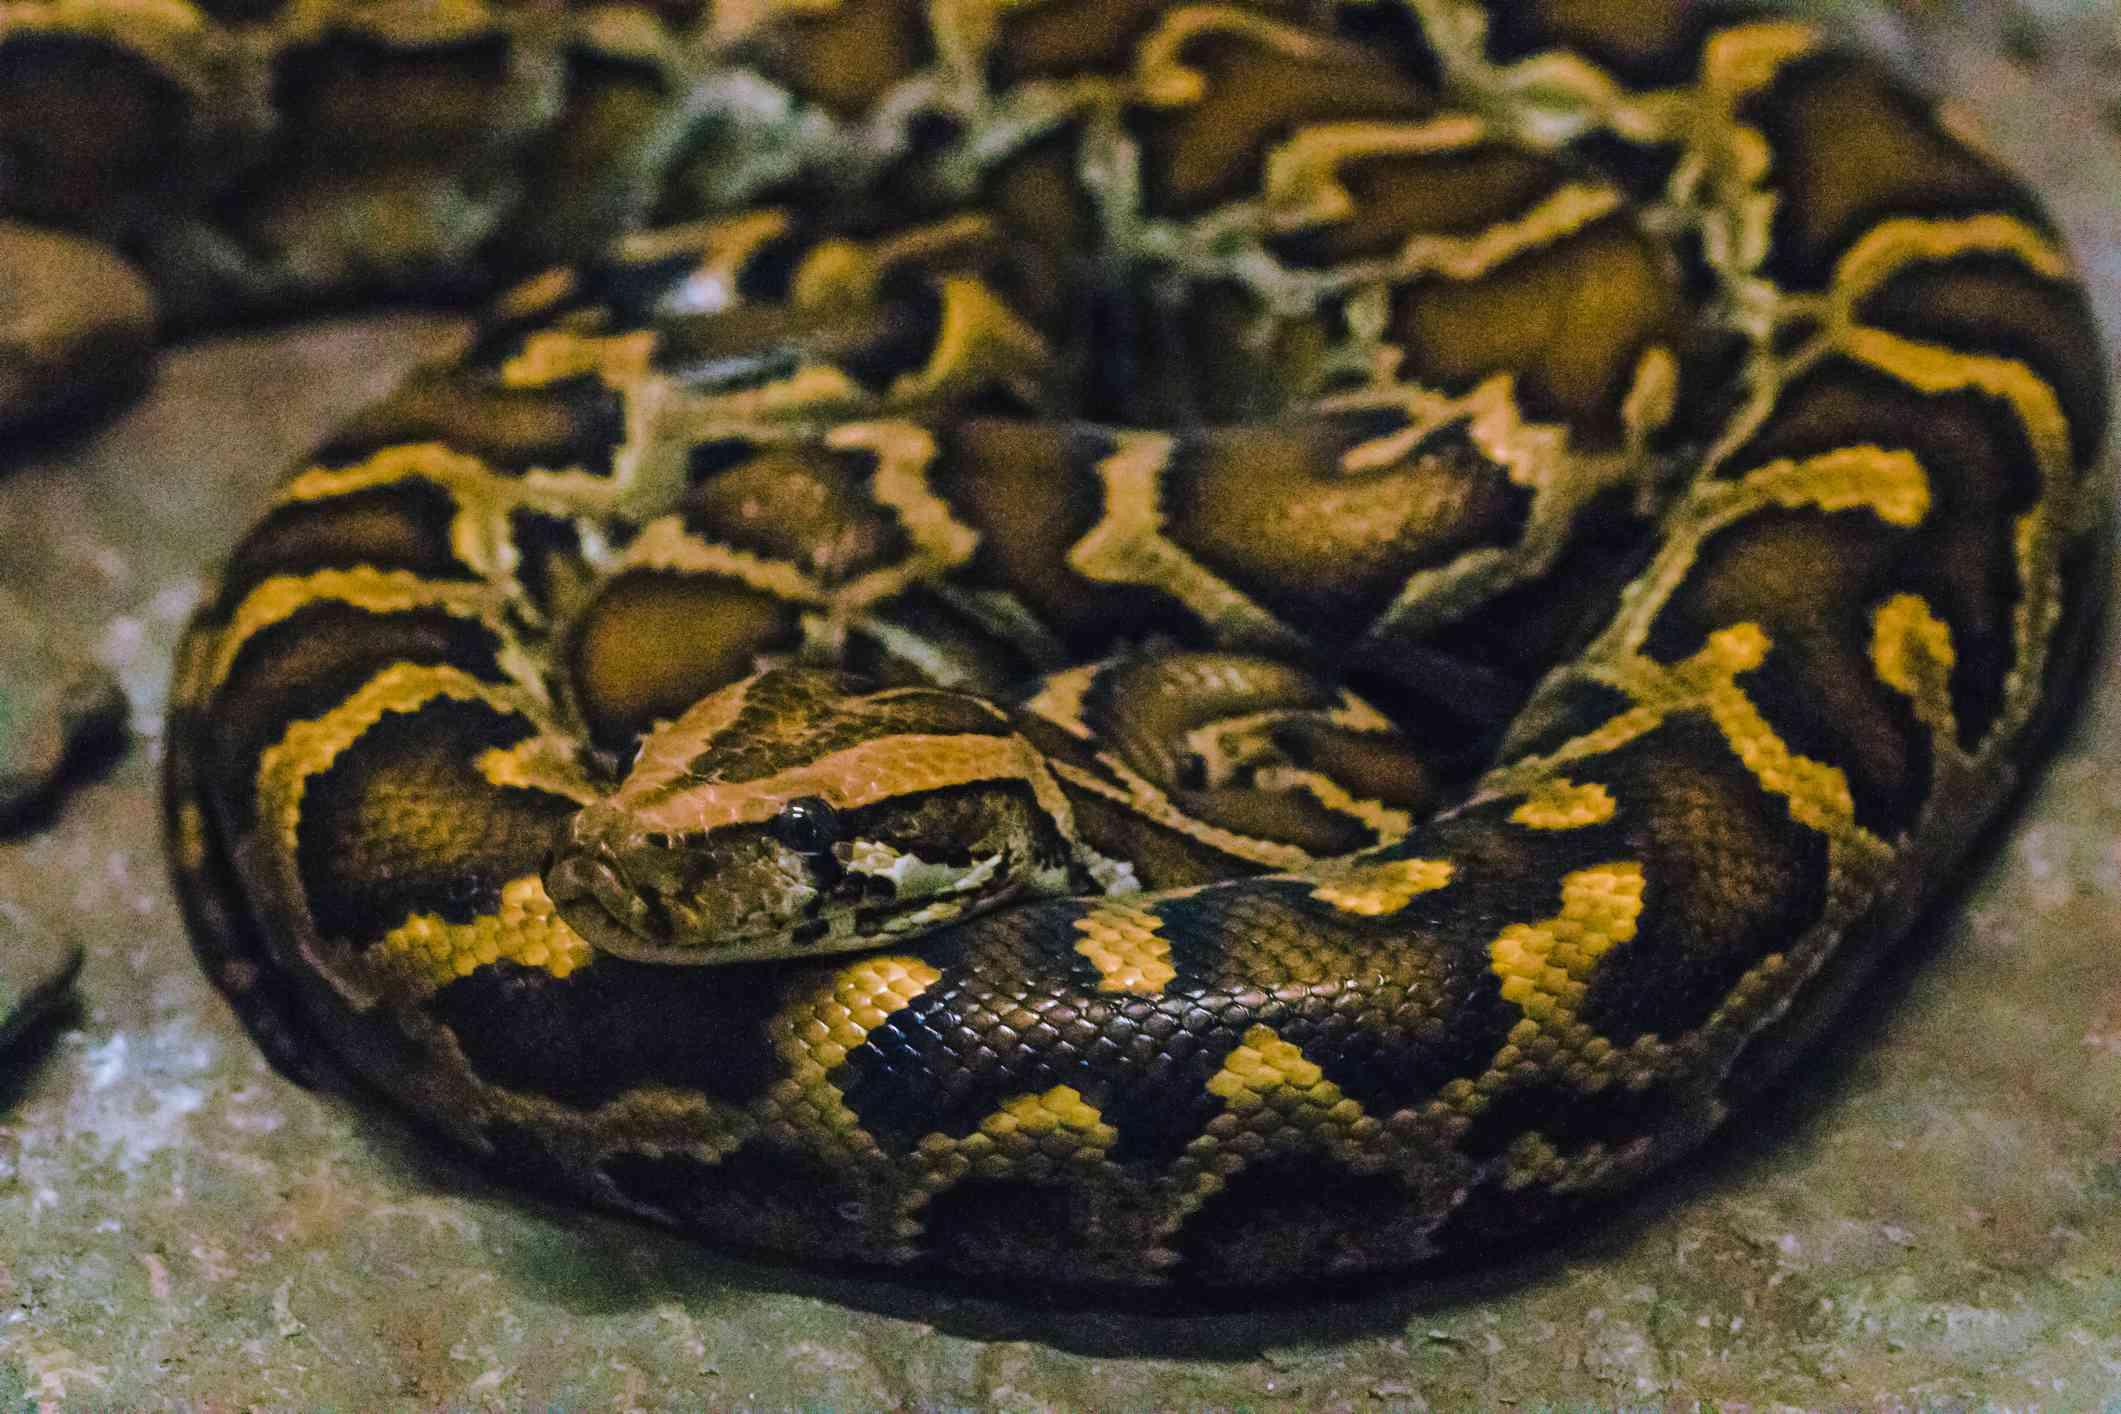 close up of burmese python coiled body